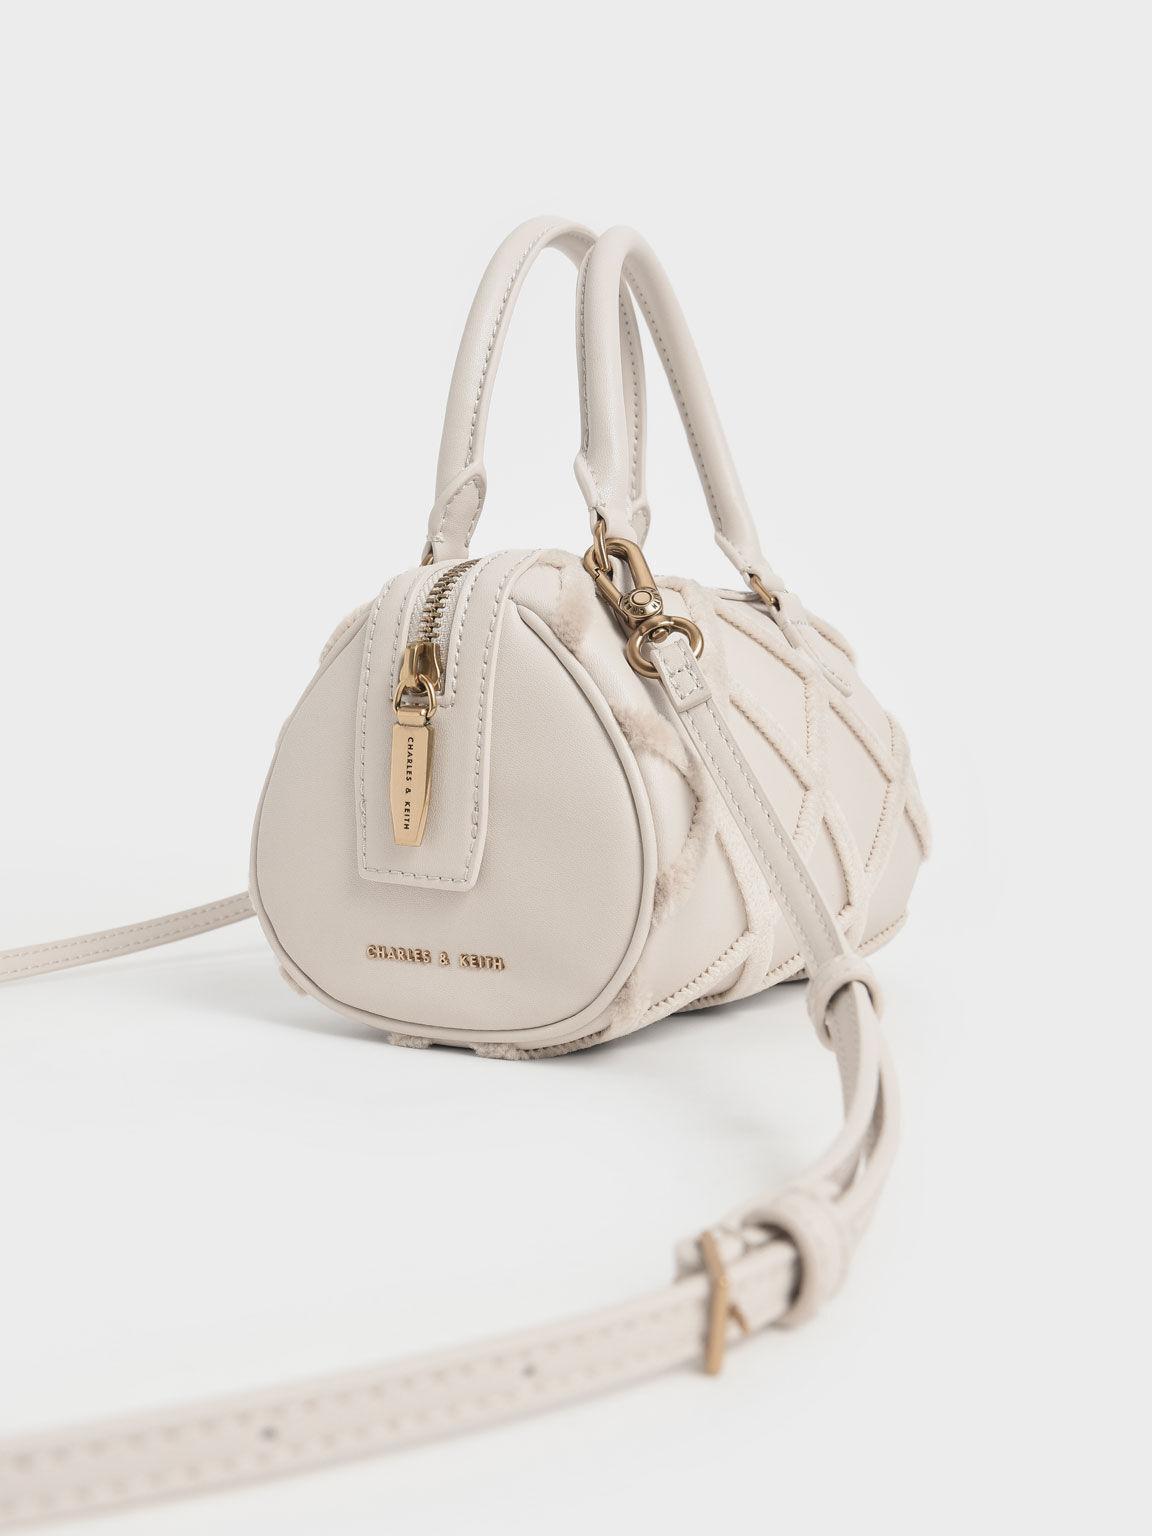 Criss-Cross Pattern Top Handle Bag, Ivory, hi-res